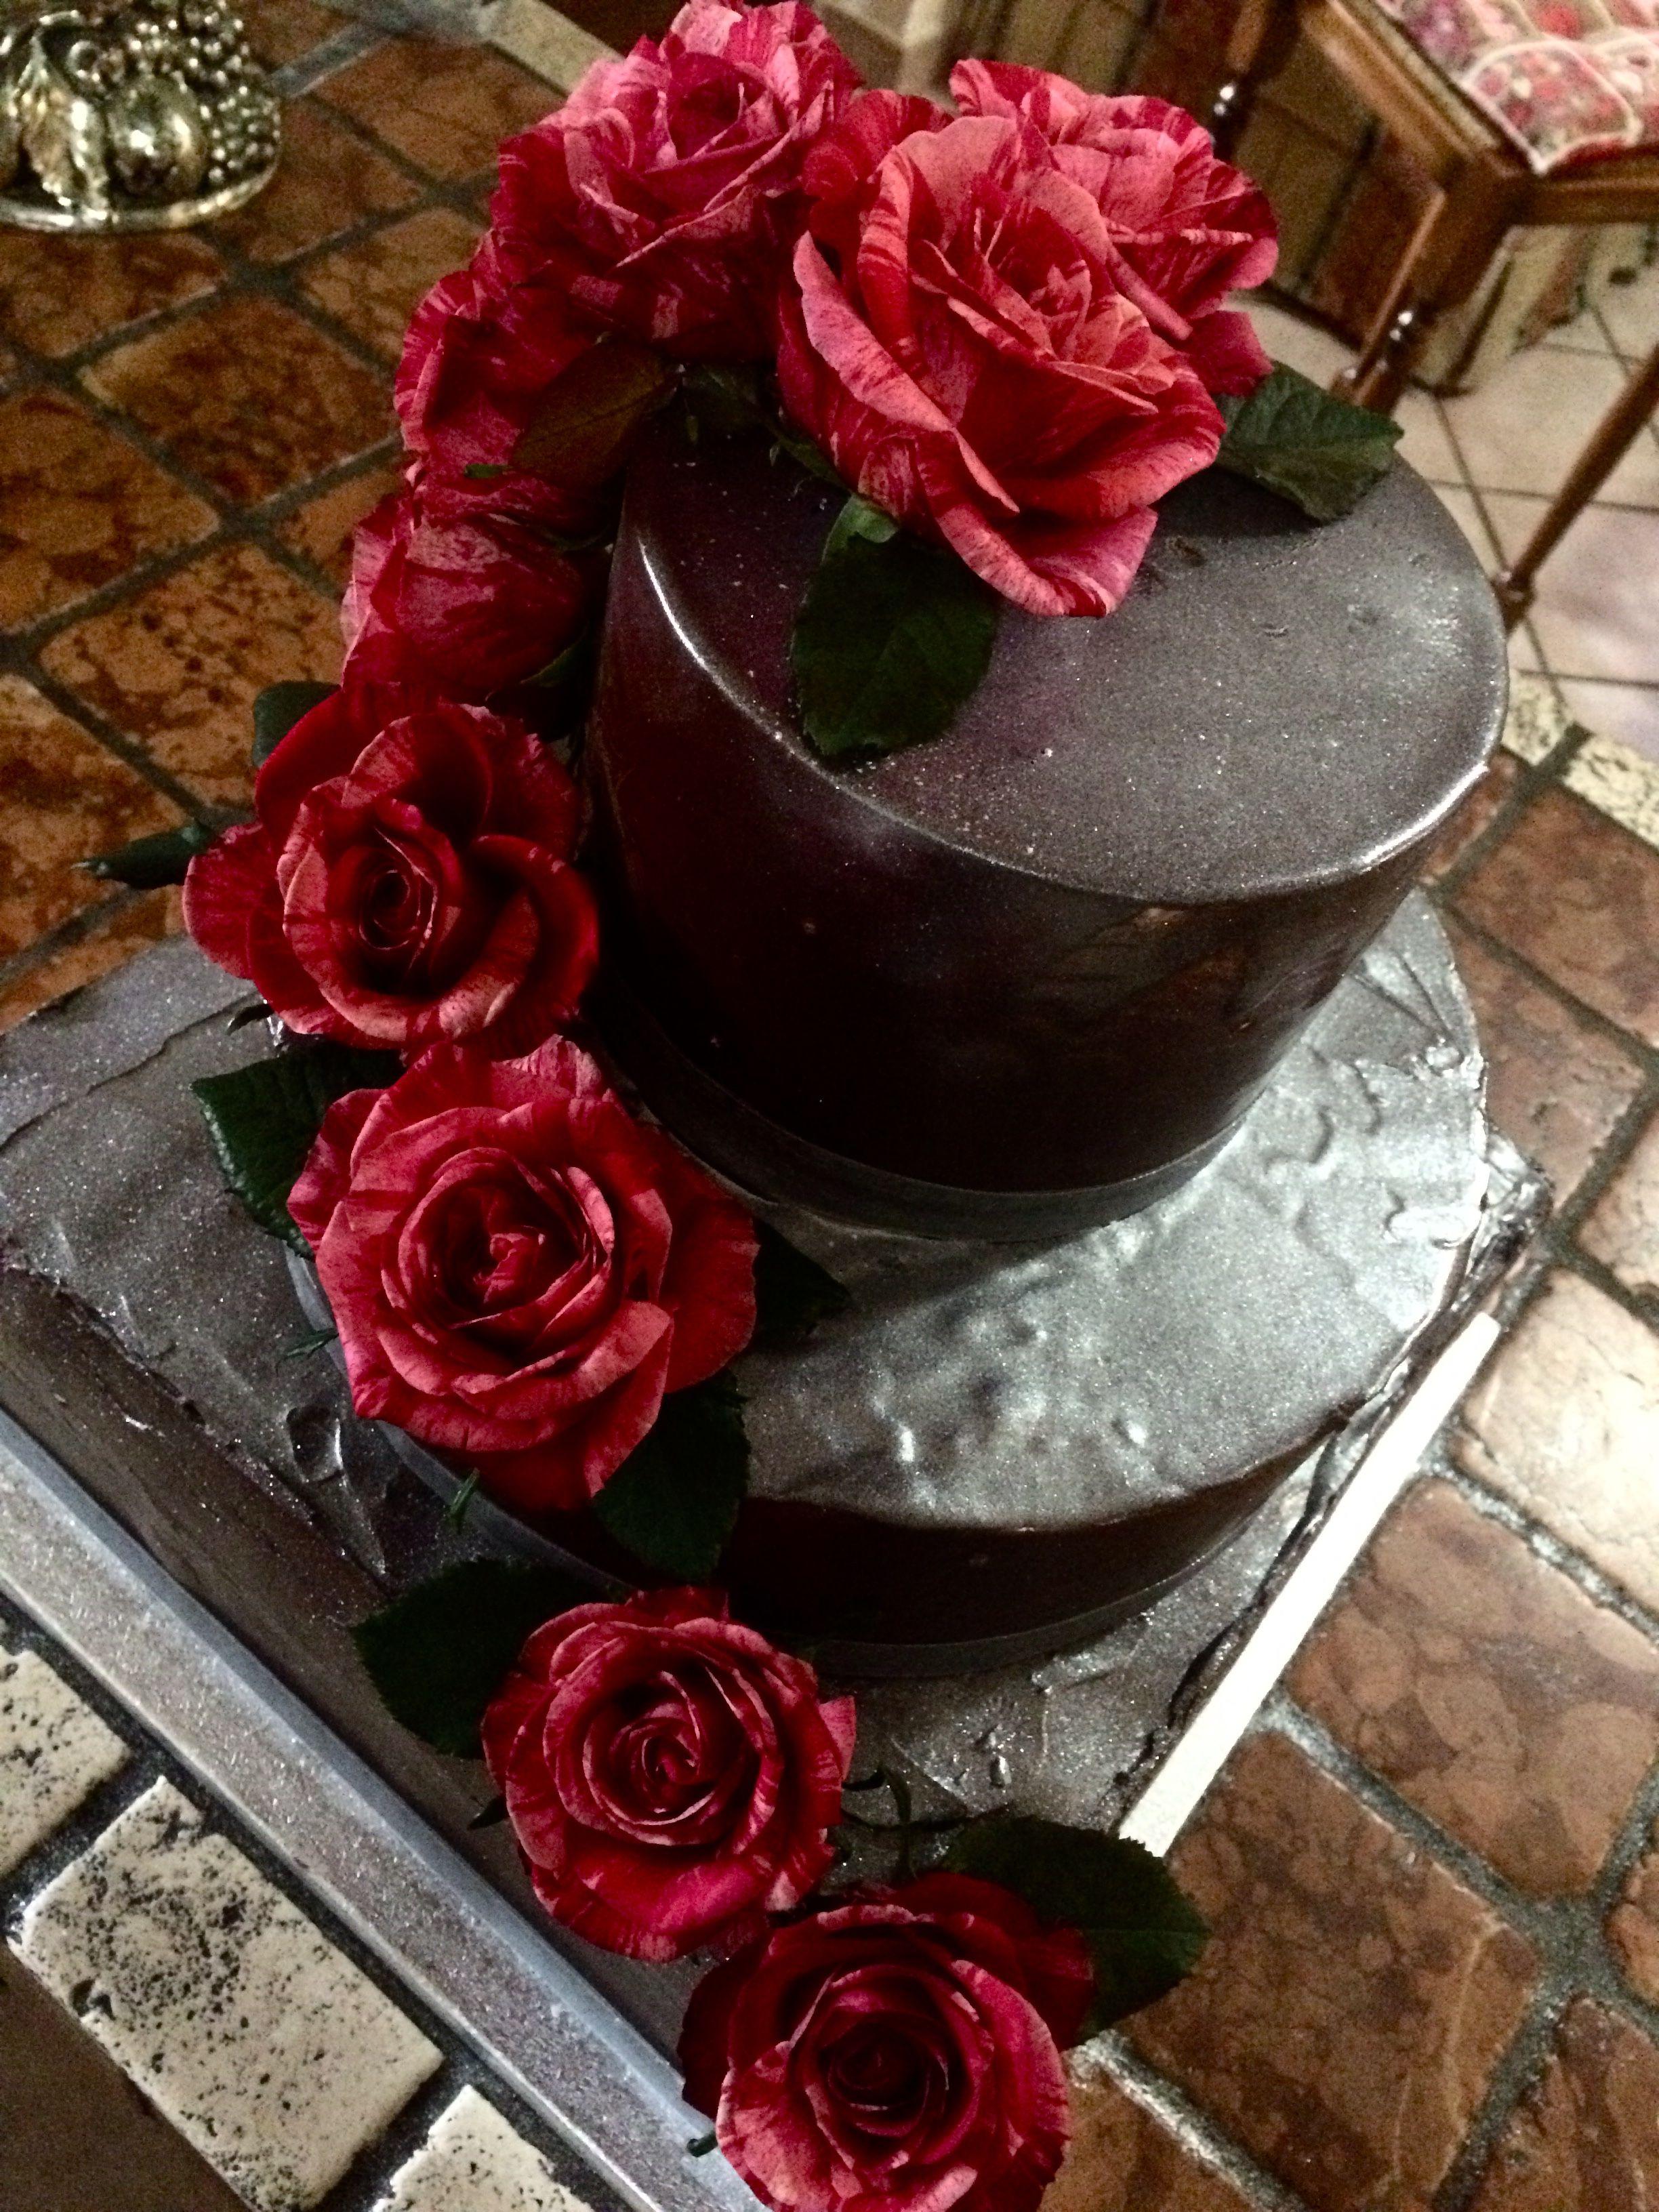 Torta al cioccolato | Torta al cioccolato, Torta al ...